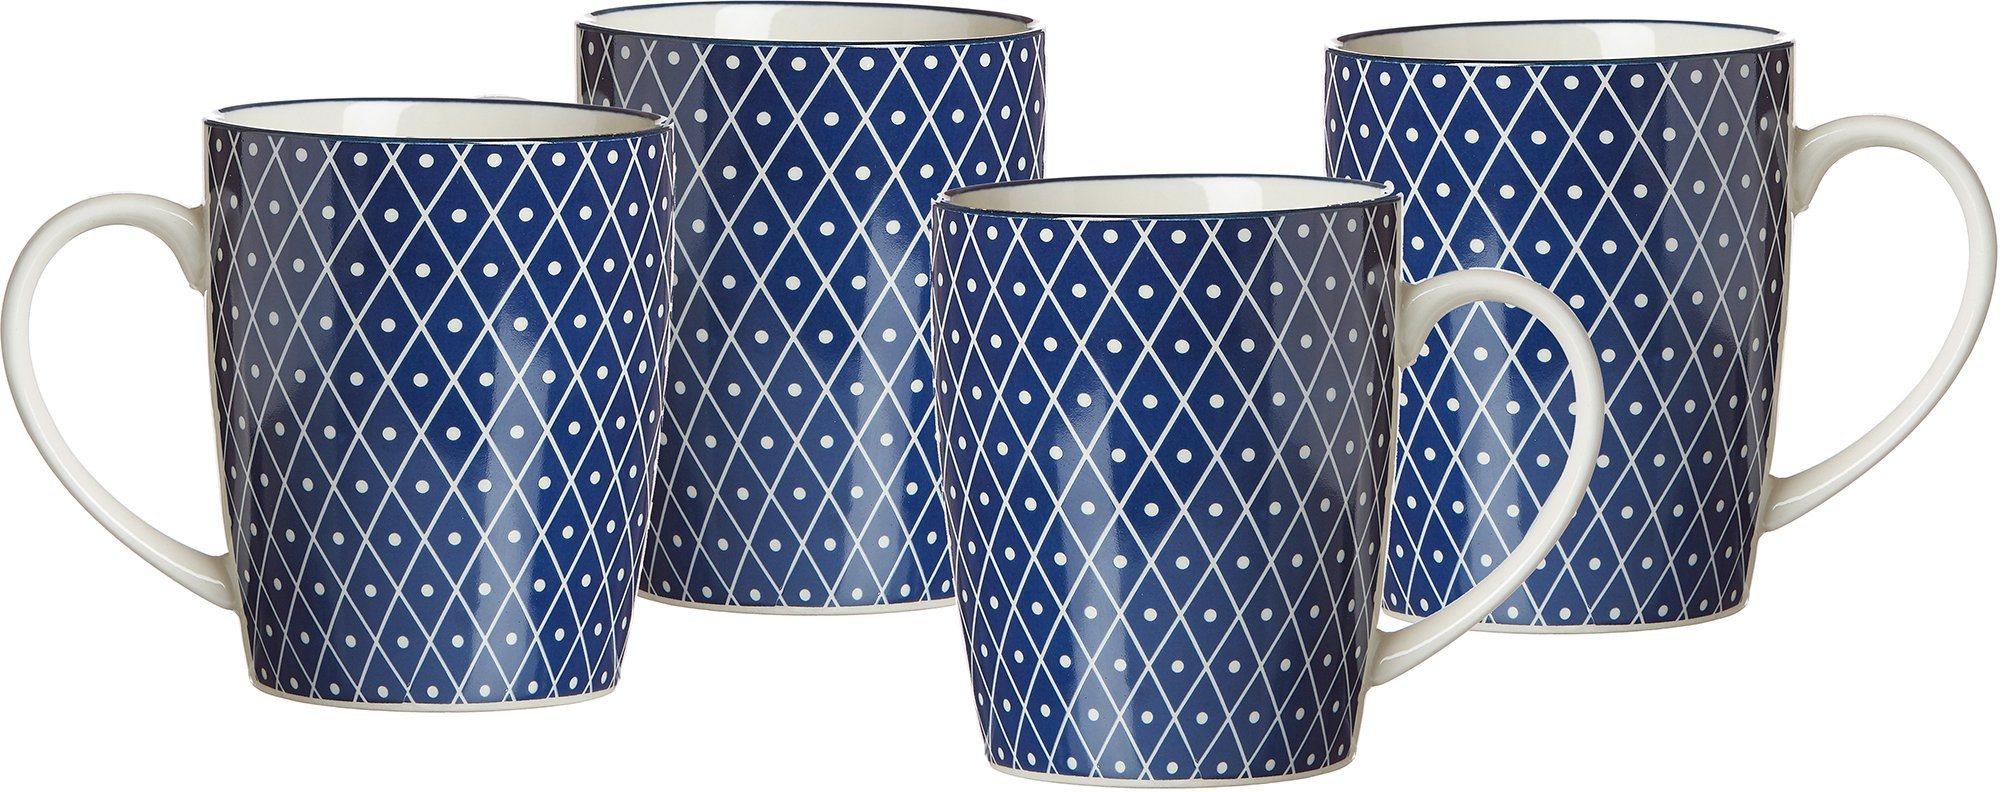 Kaffeebecher, Keramik, 4 Teile, »ROYAL REIKO«